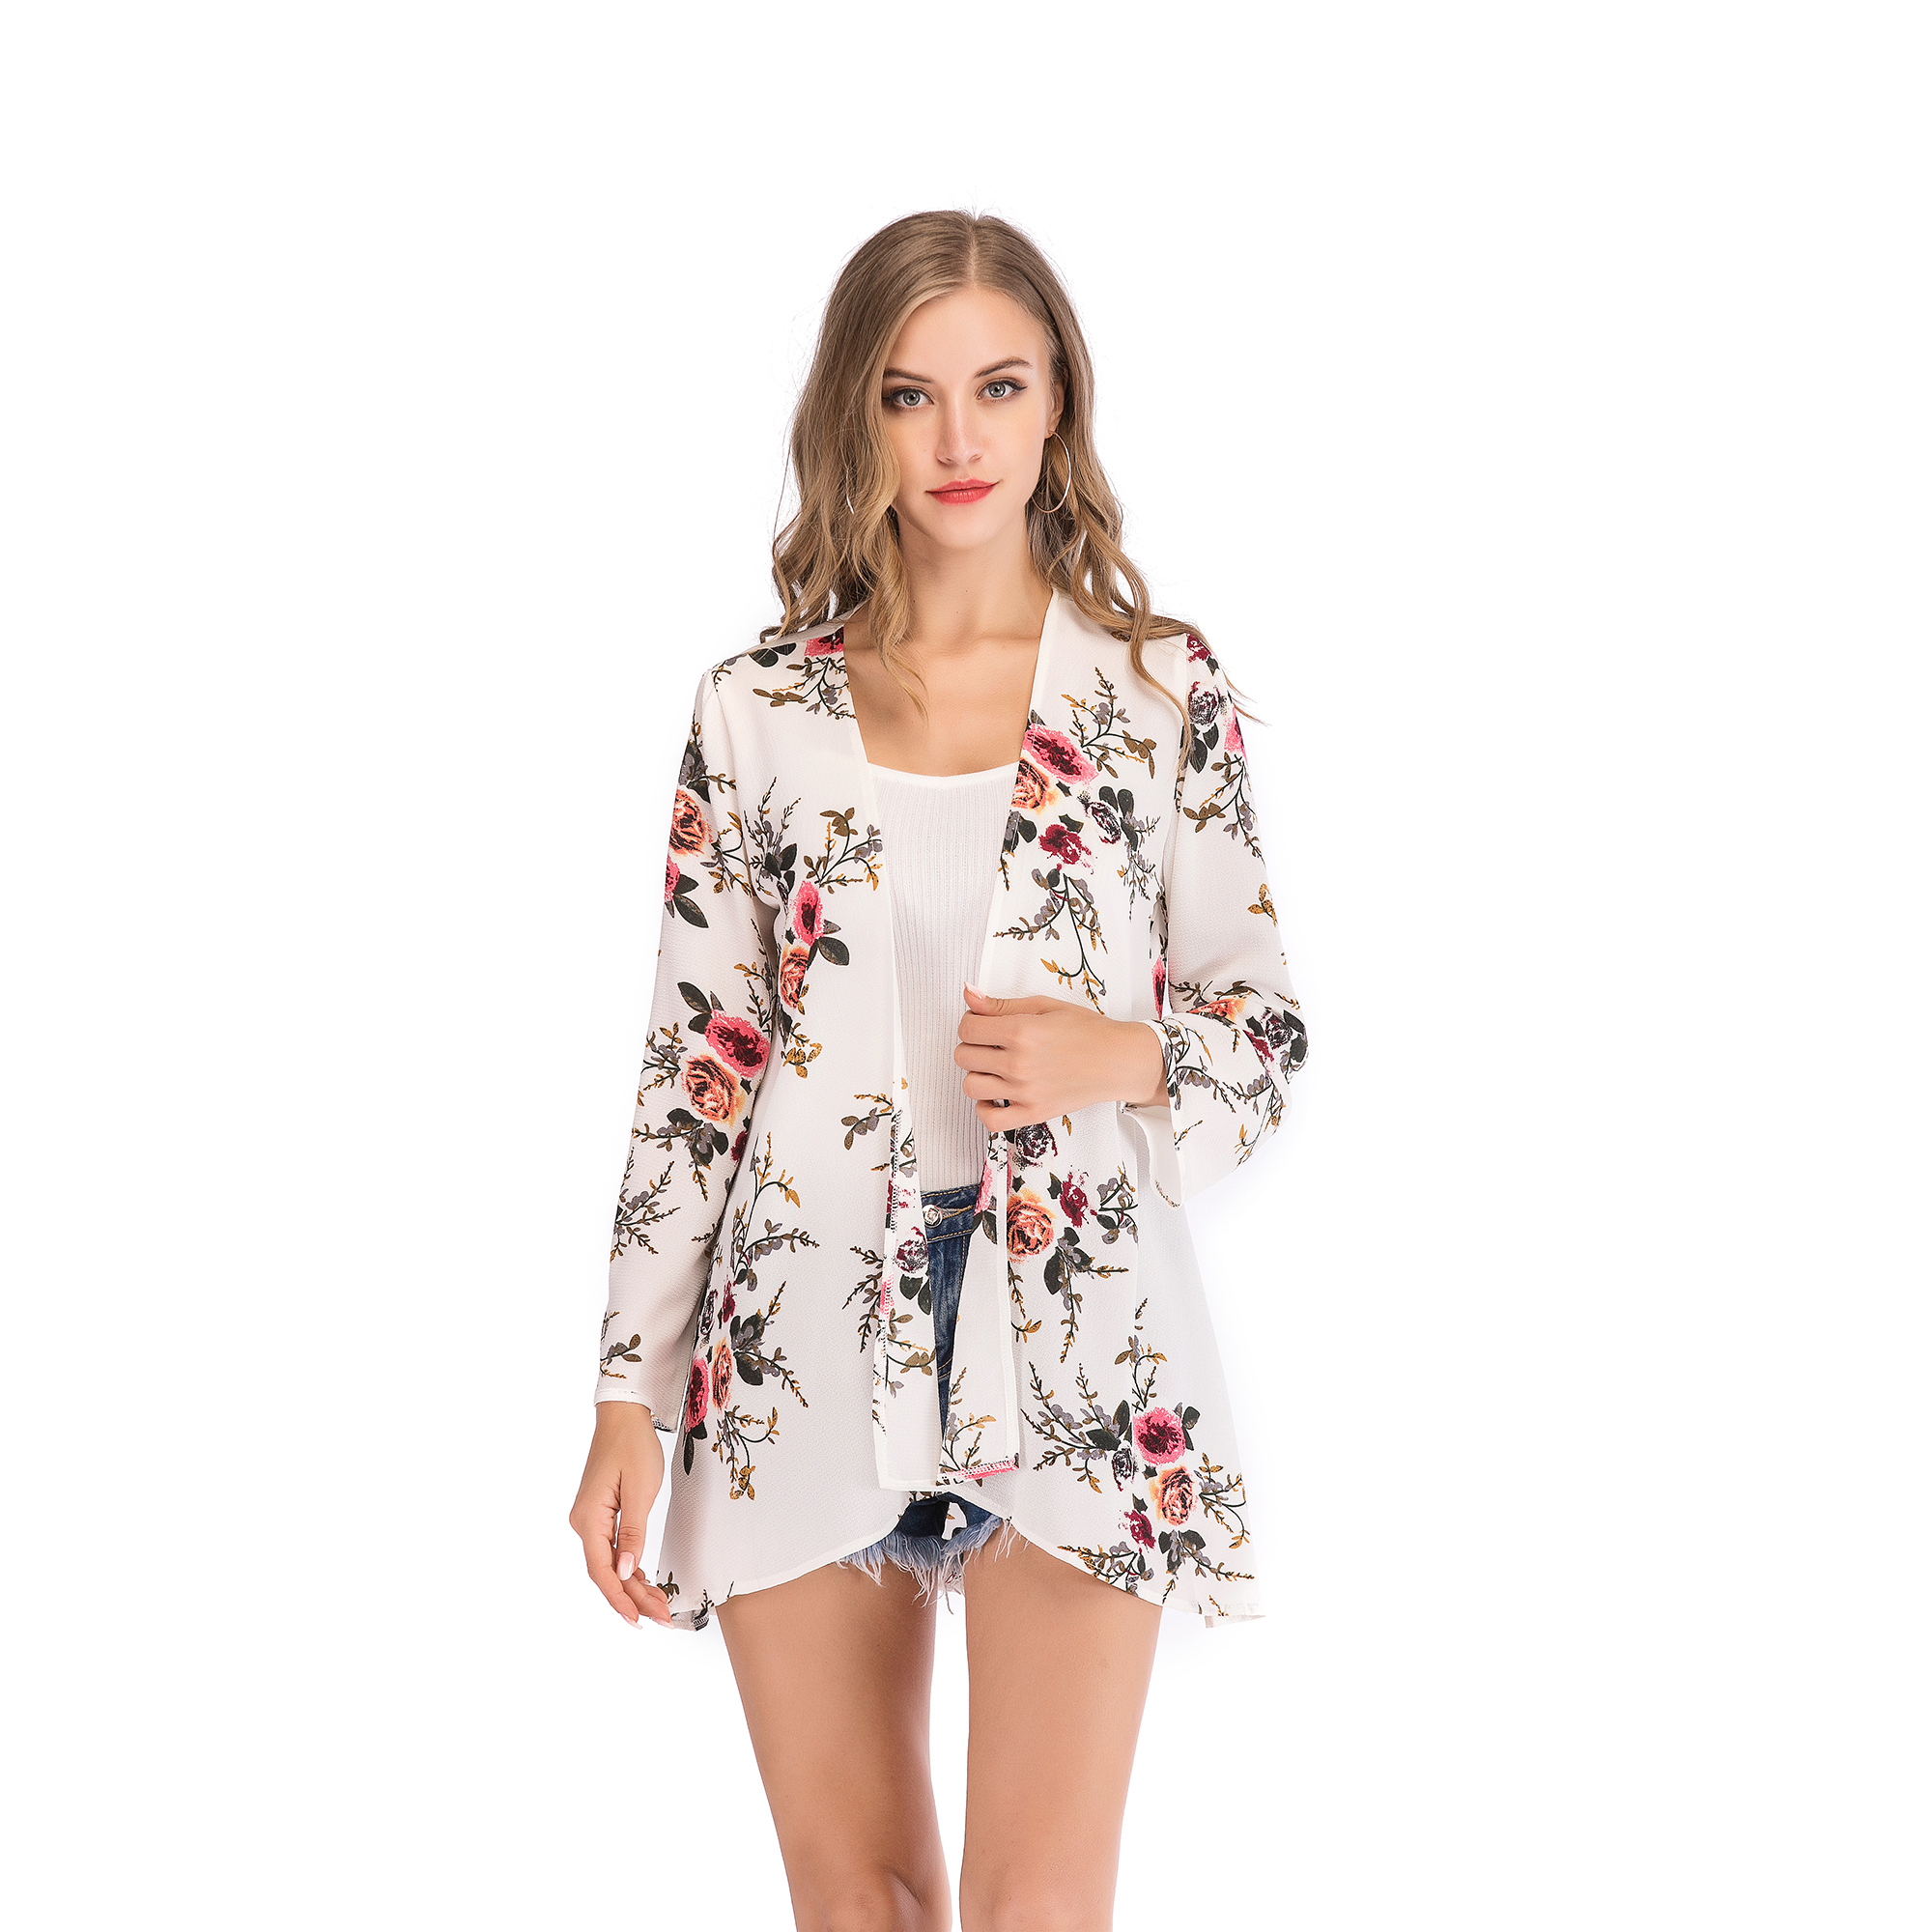 Fashion-Women-Loose-Blouse-Kimono-Cardigan-Tops-Summer-Bikini-Cover-Up-Wrap-Coat thumbnail 31